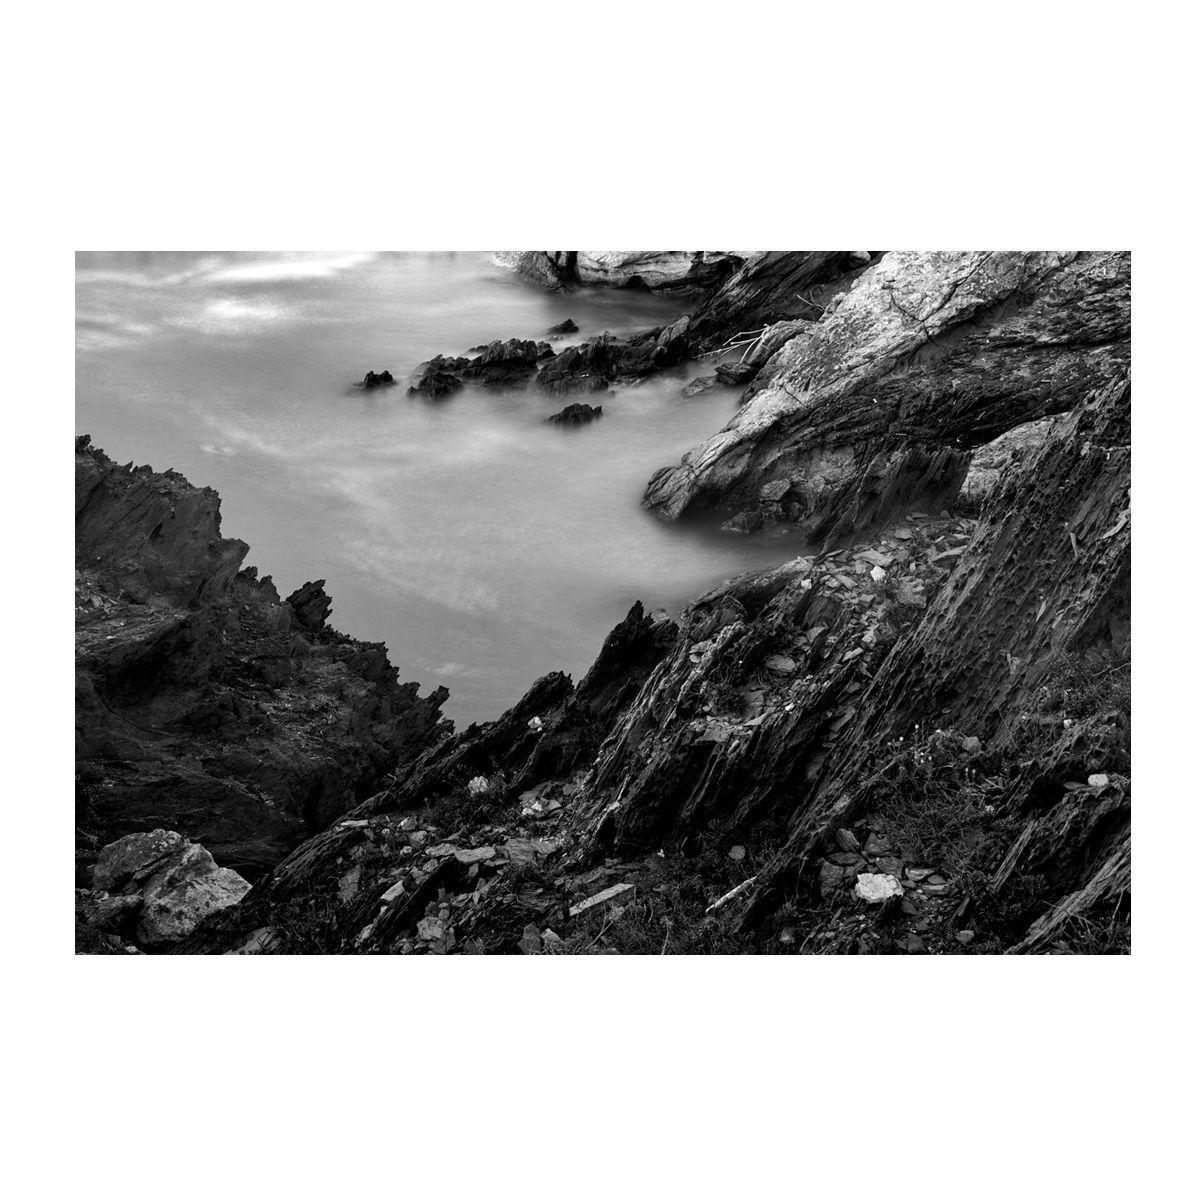 sarabiaphoto-cap-de-creus-22-web